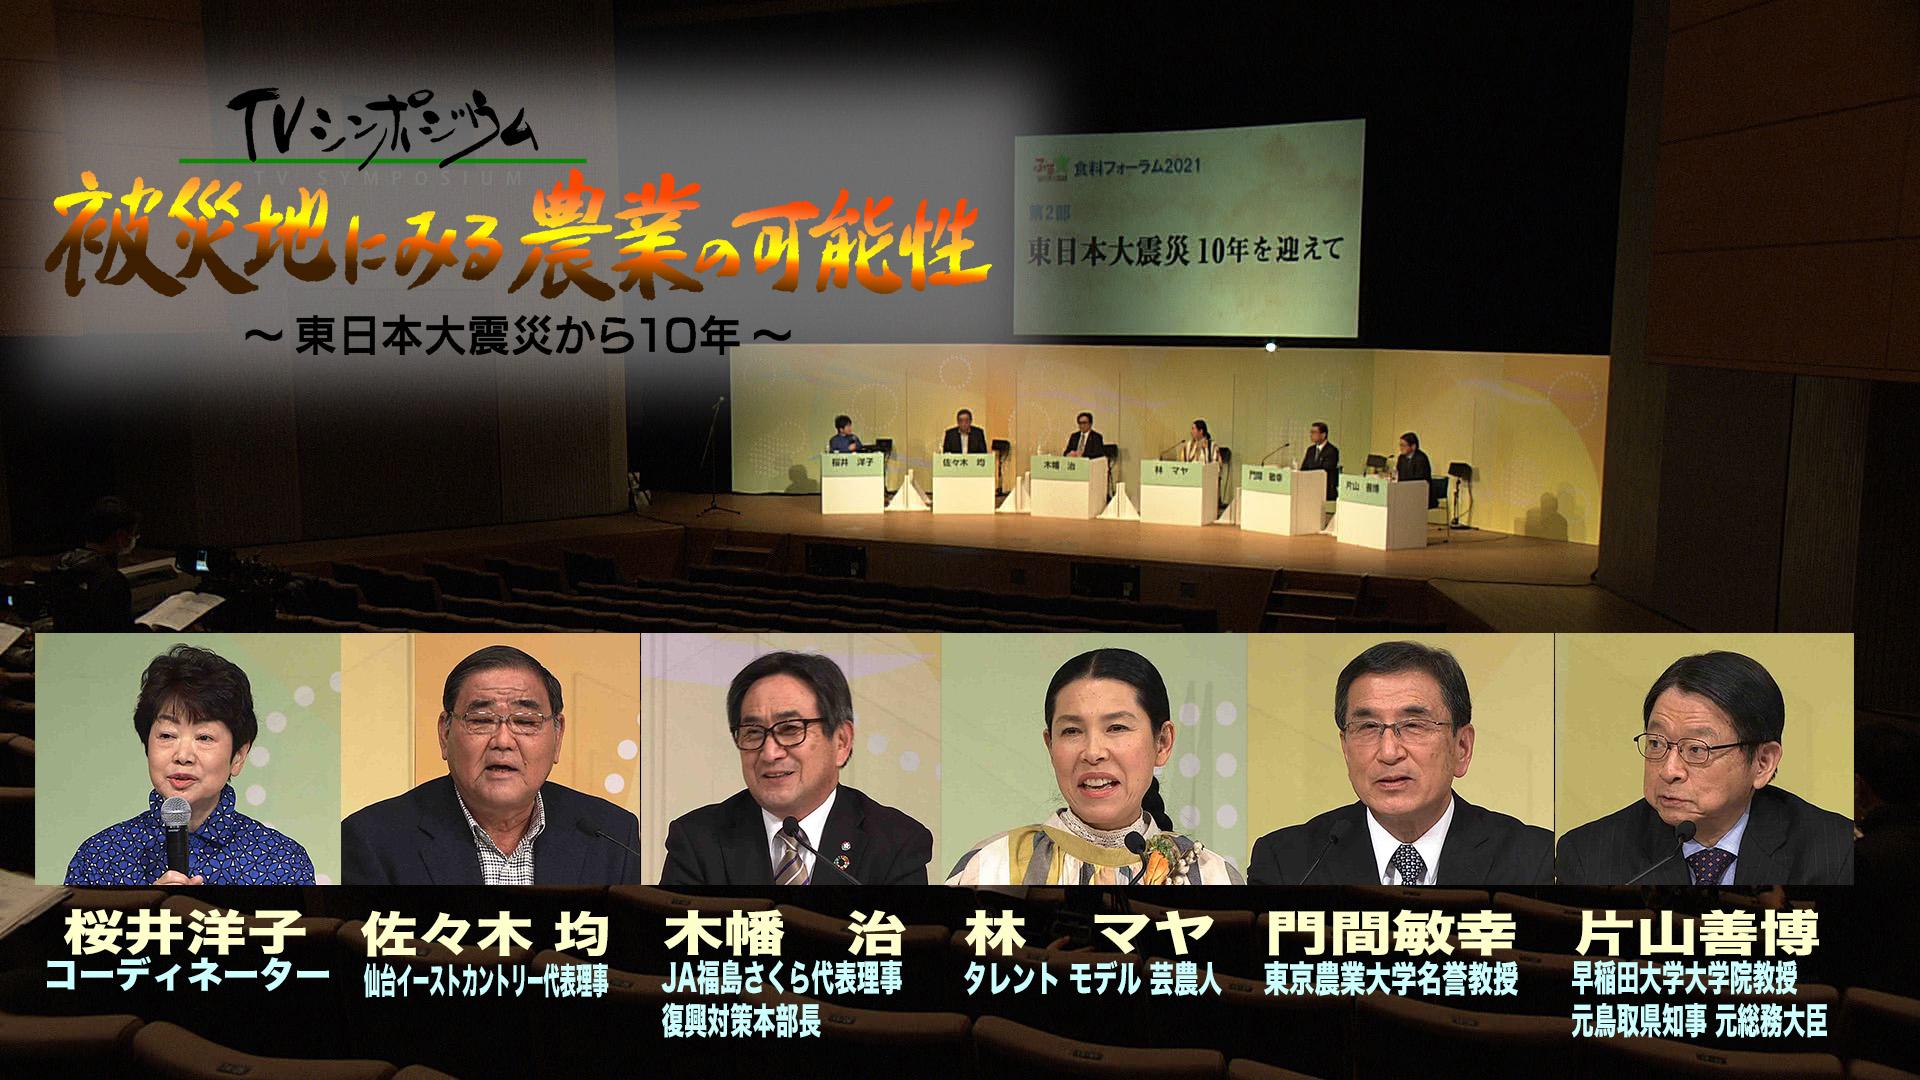 TVシンポジウム「震災10年」